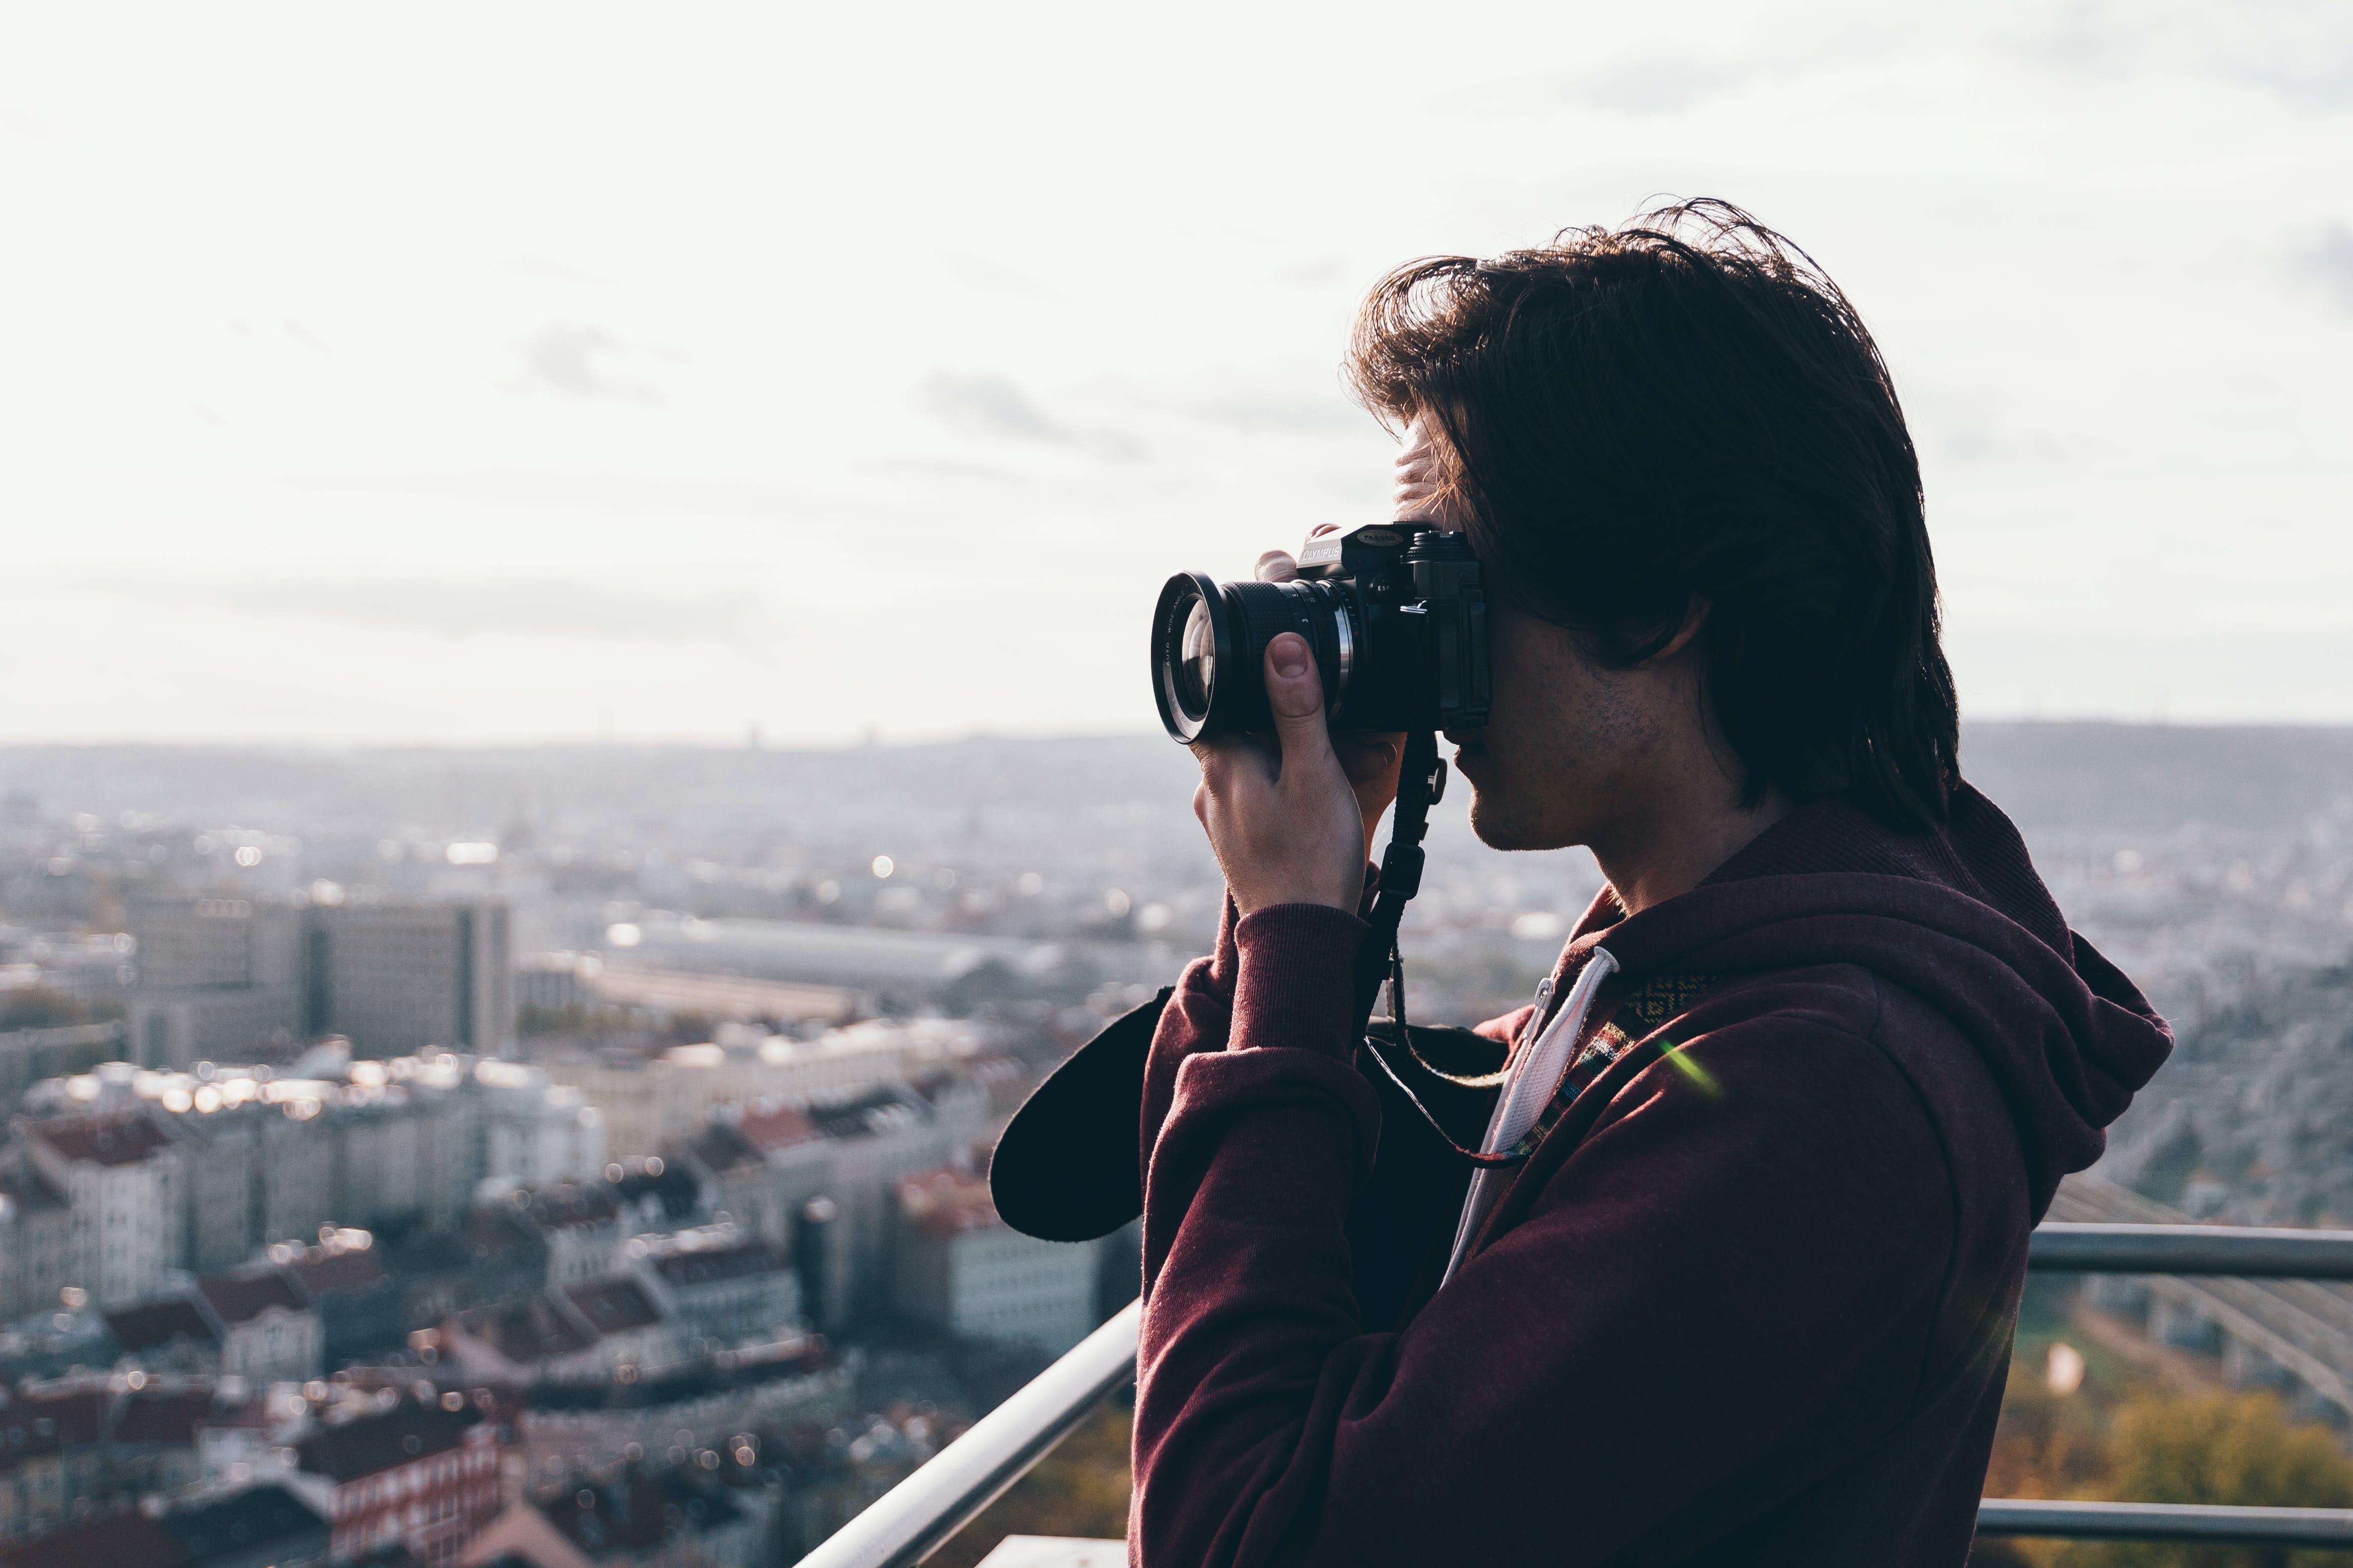 Man in Maroon Jacket Using Camera